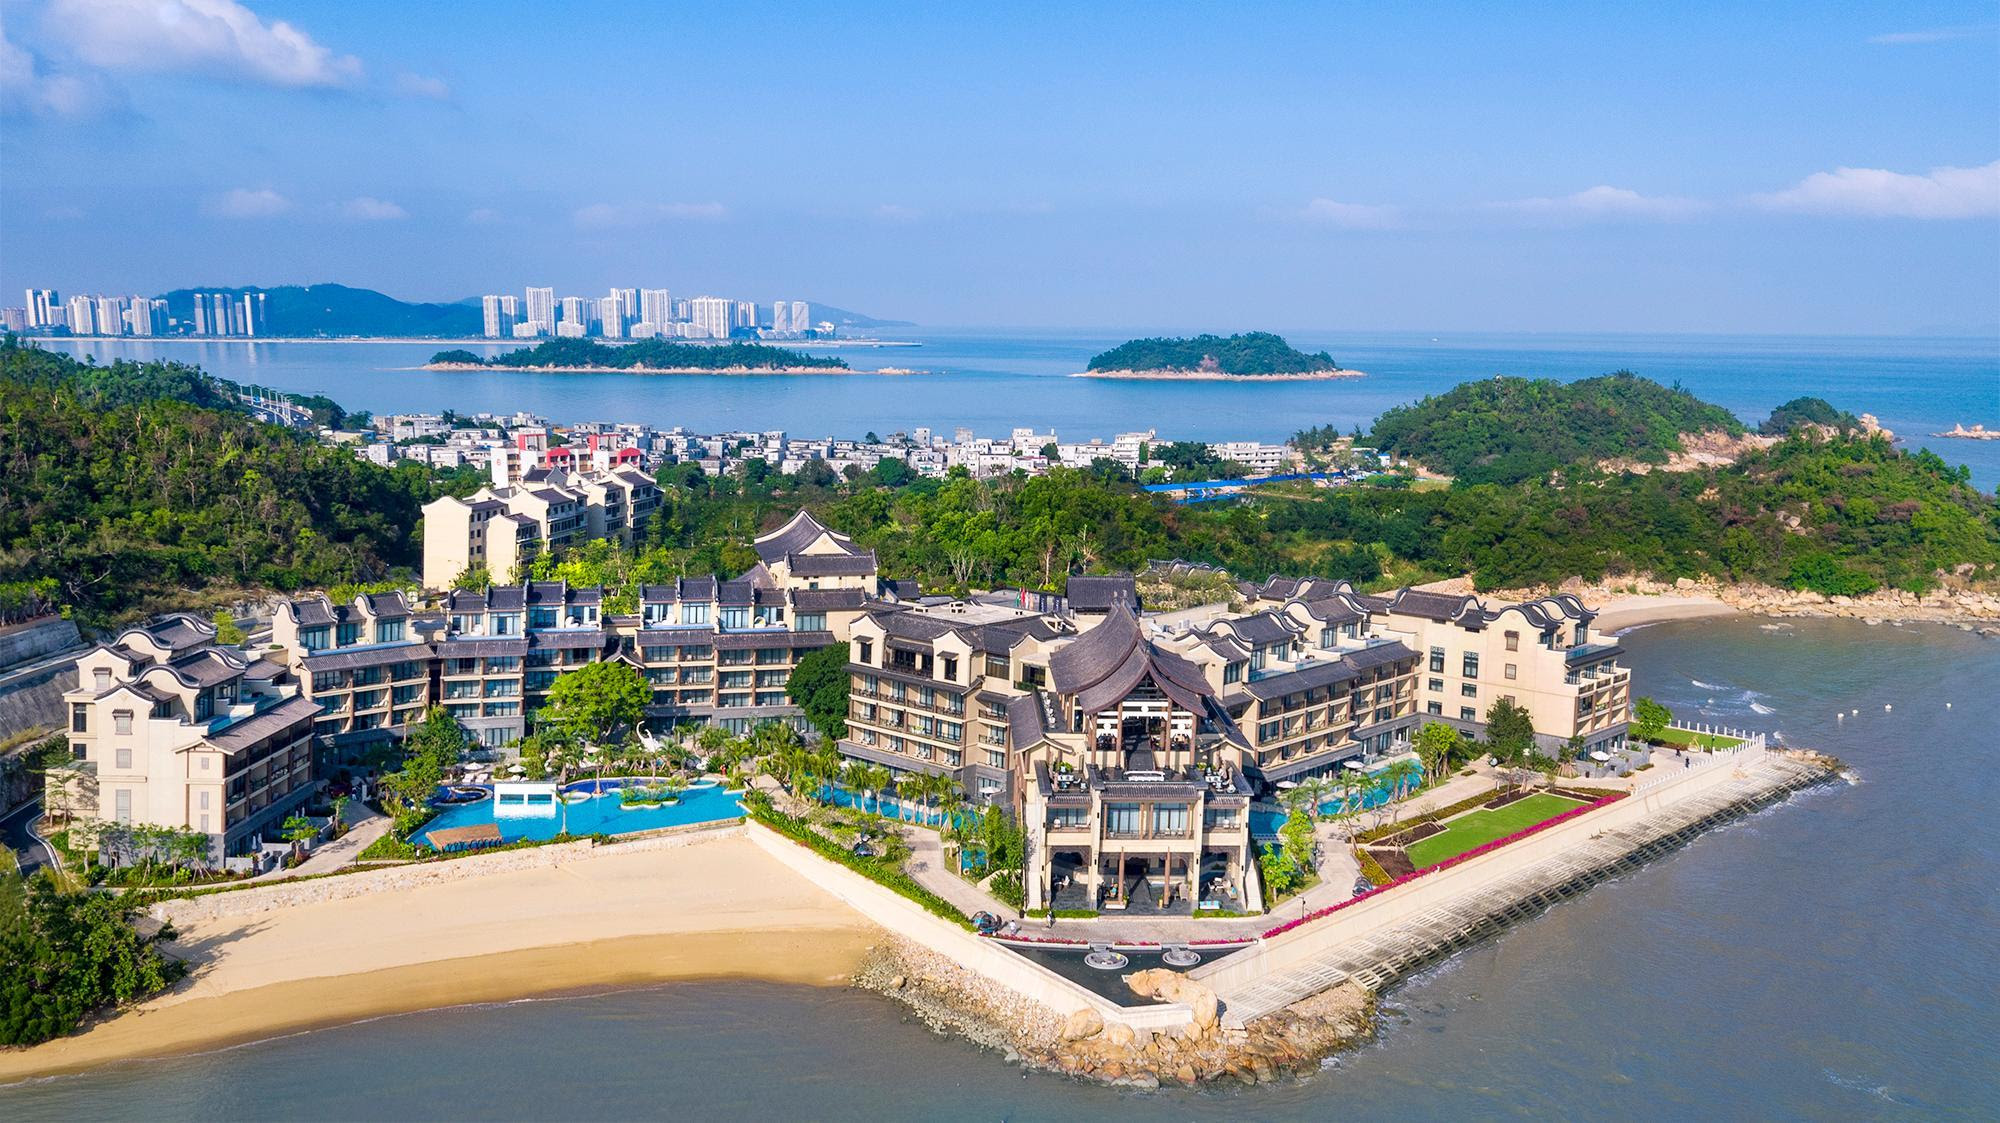 Angsana Zhuhai Phoenix Bay Reviews